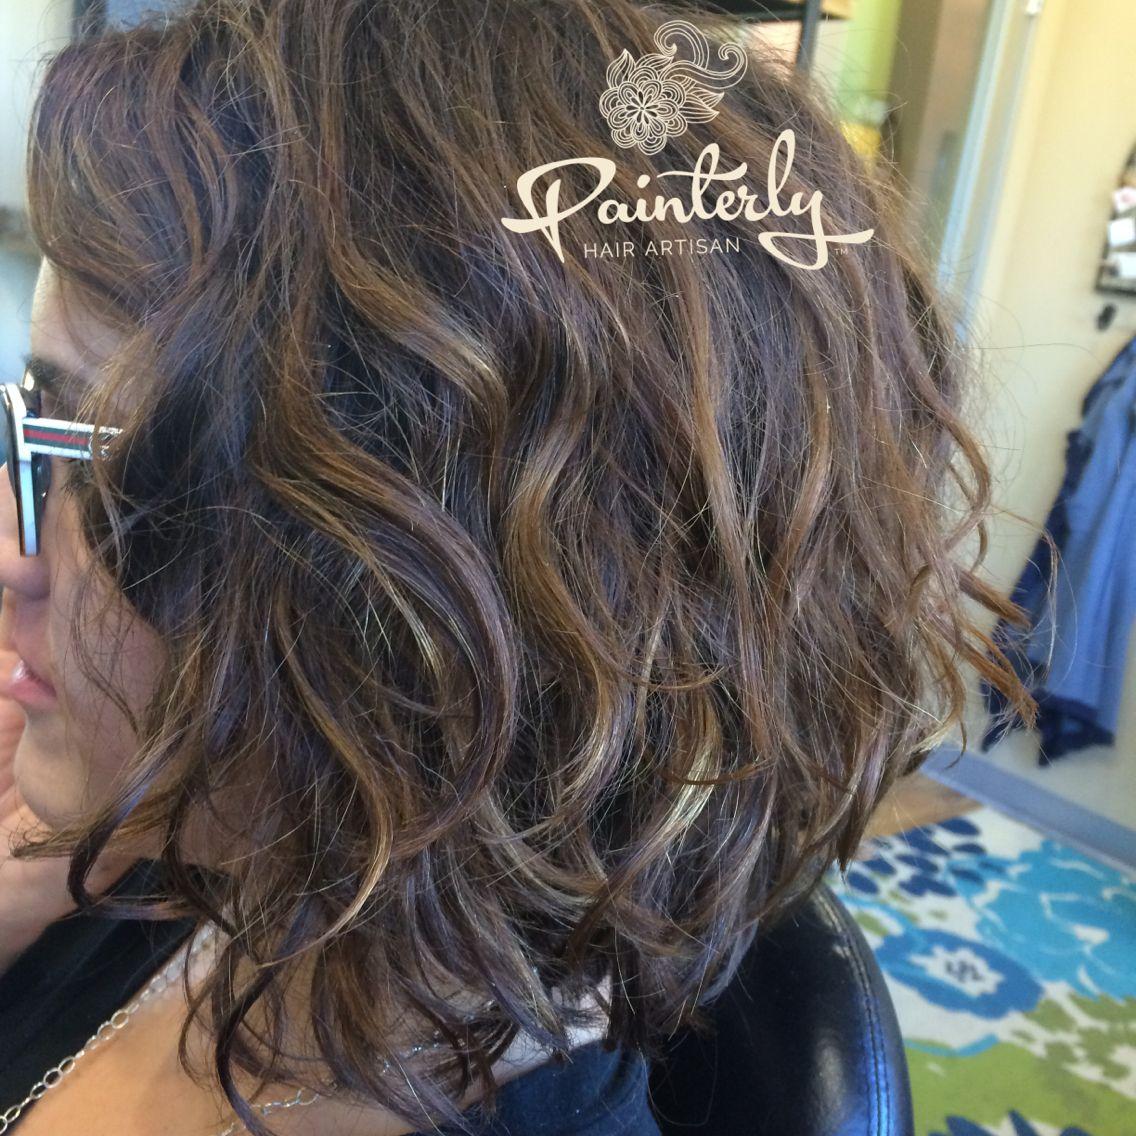 A Line Bob Haircut Diffused For A Beachy Wave Hair Painting